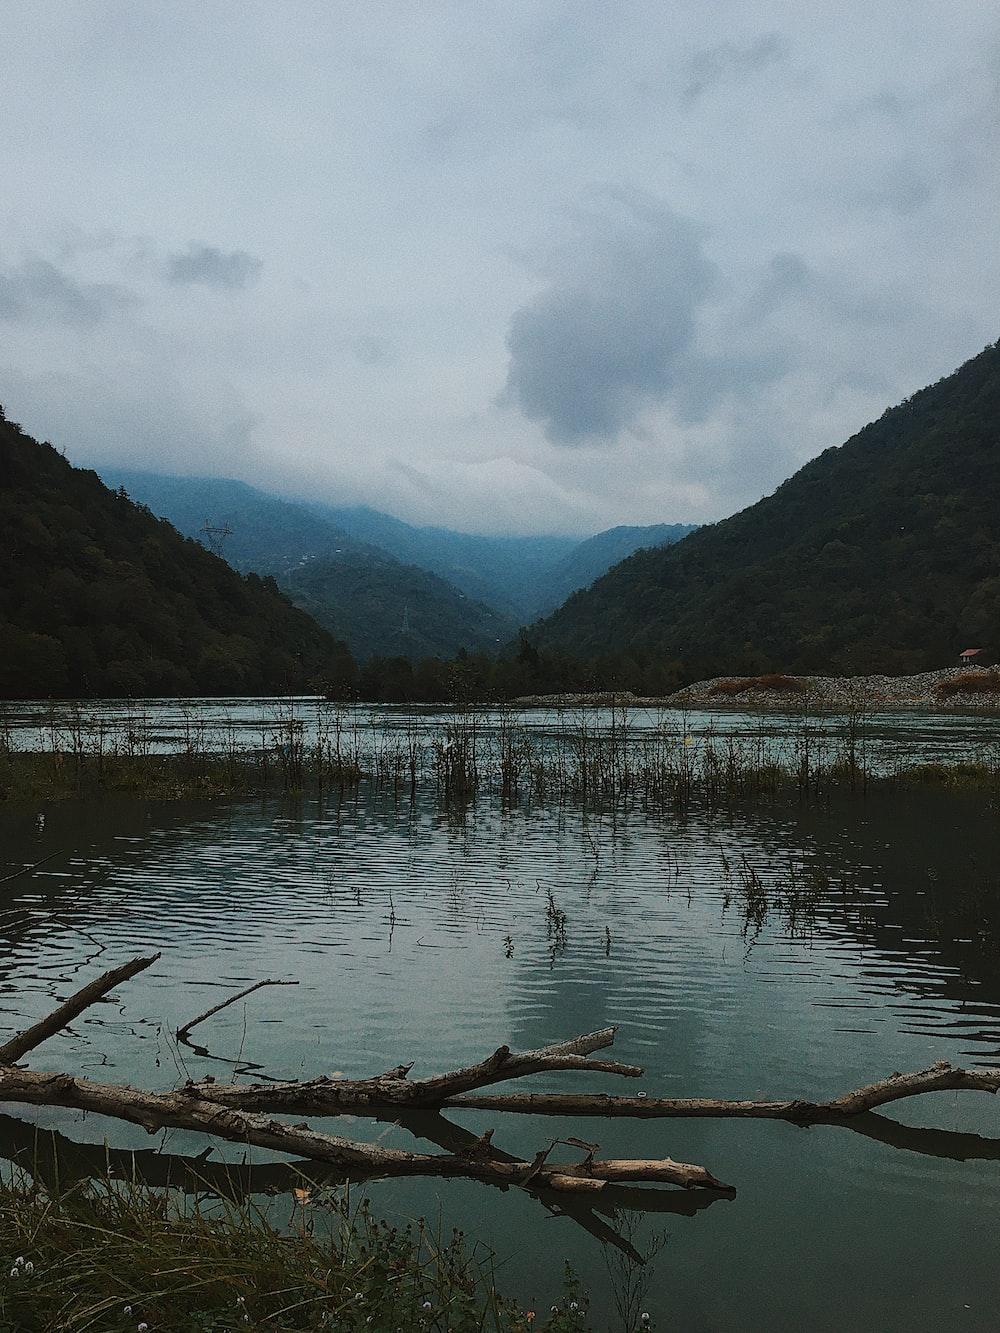 mountain beside calm body of water